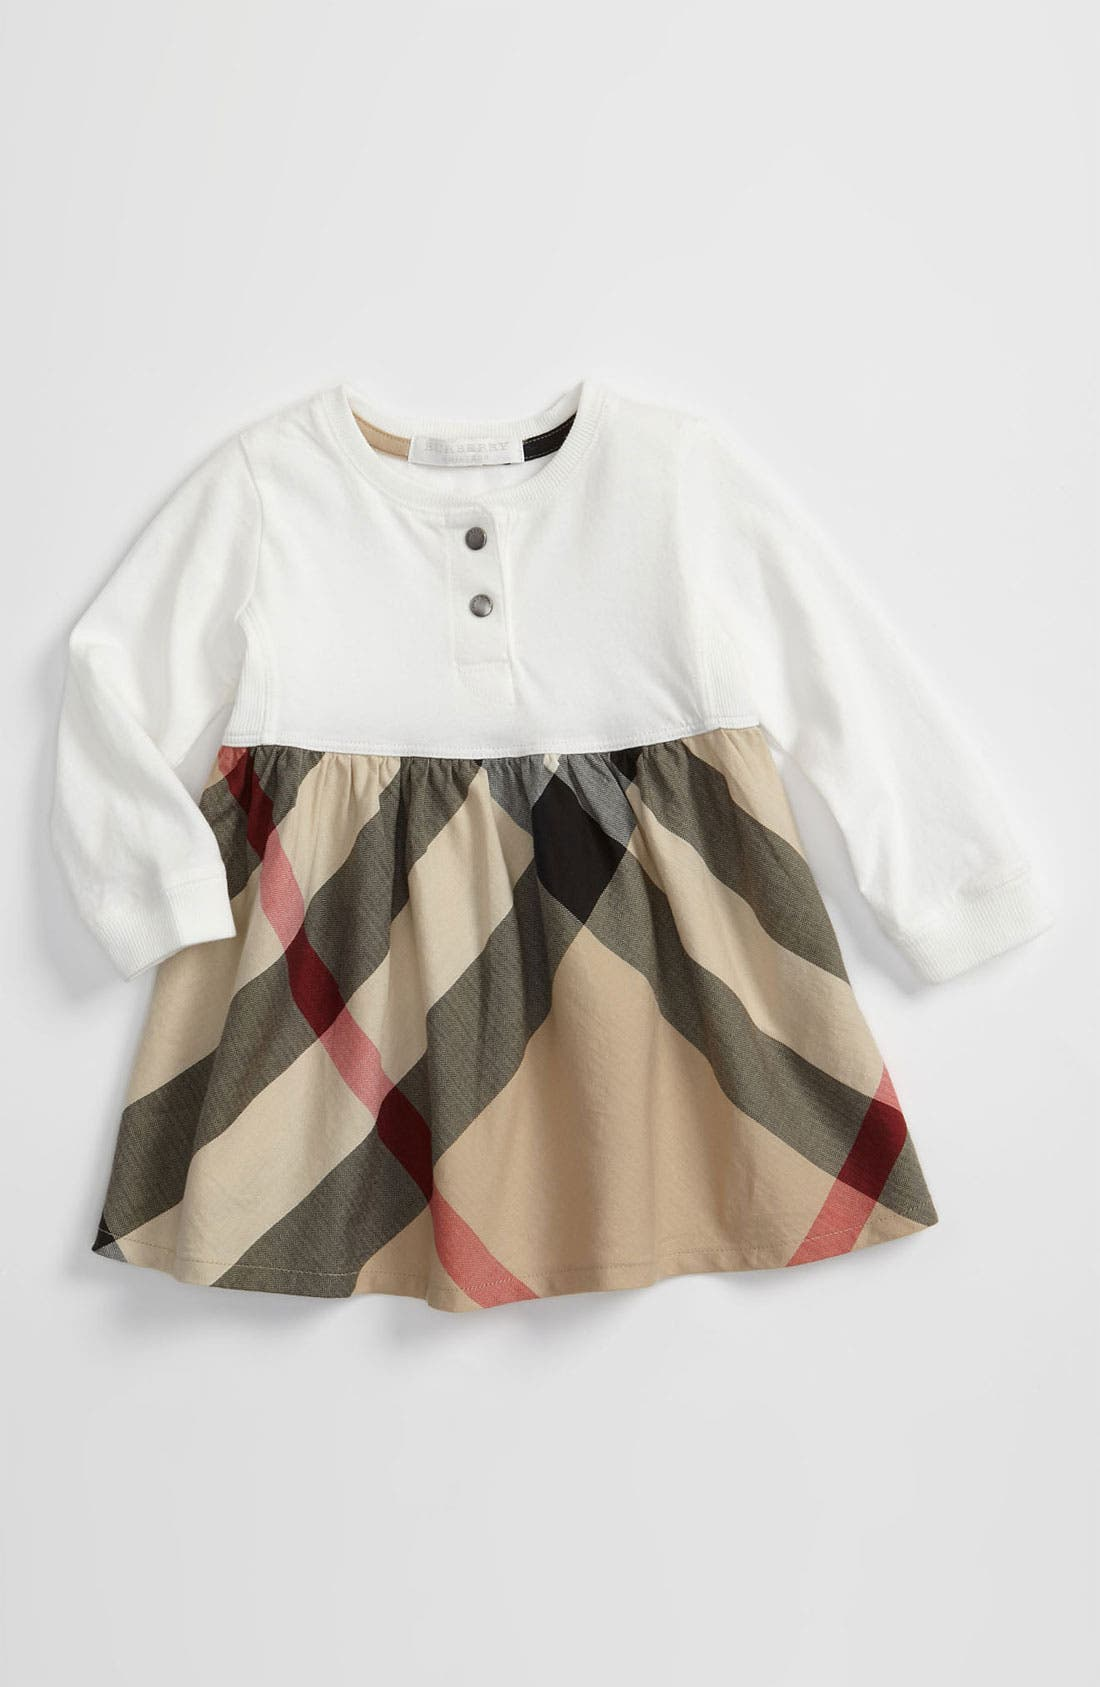 Main Image - Burberry Check Print Dress (Toddler)